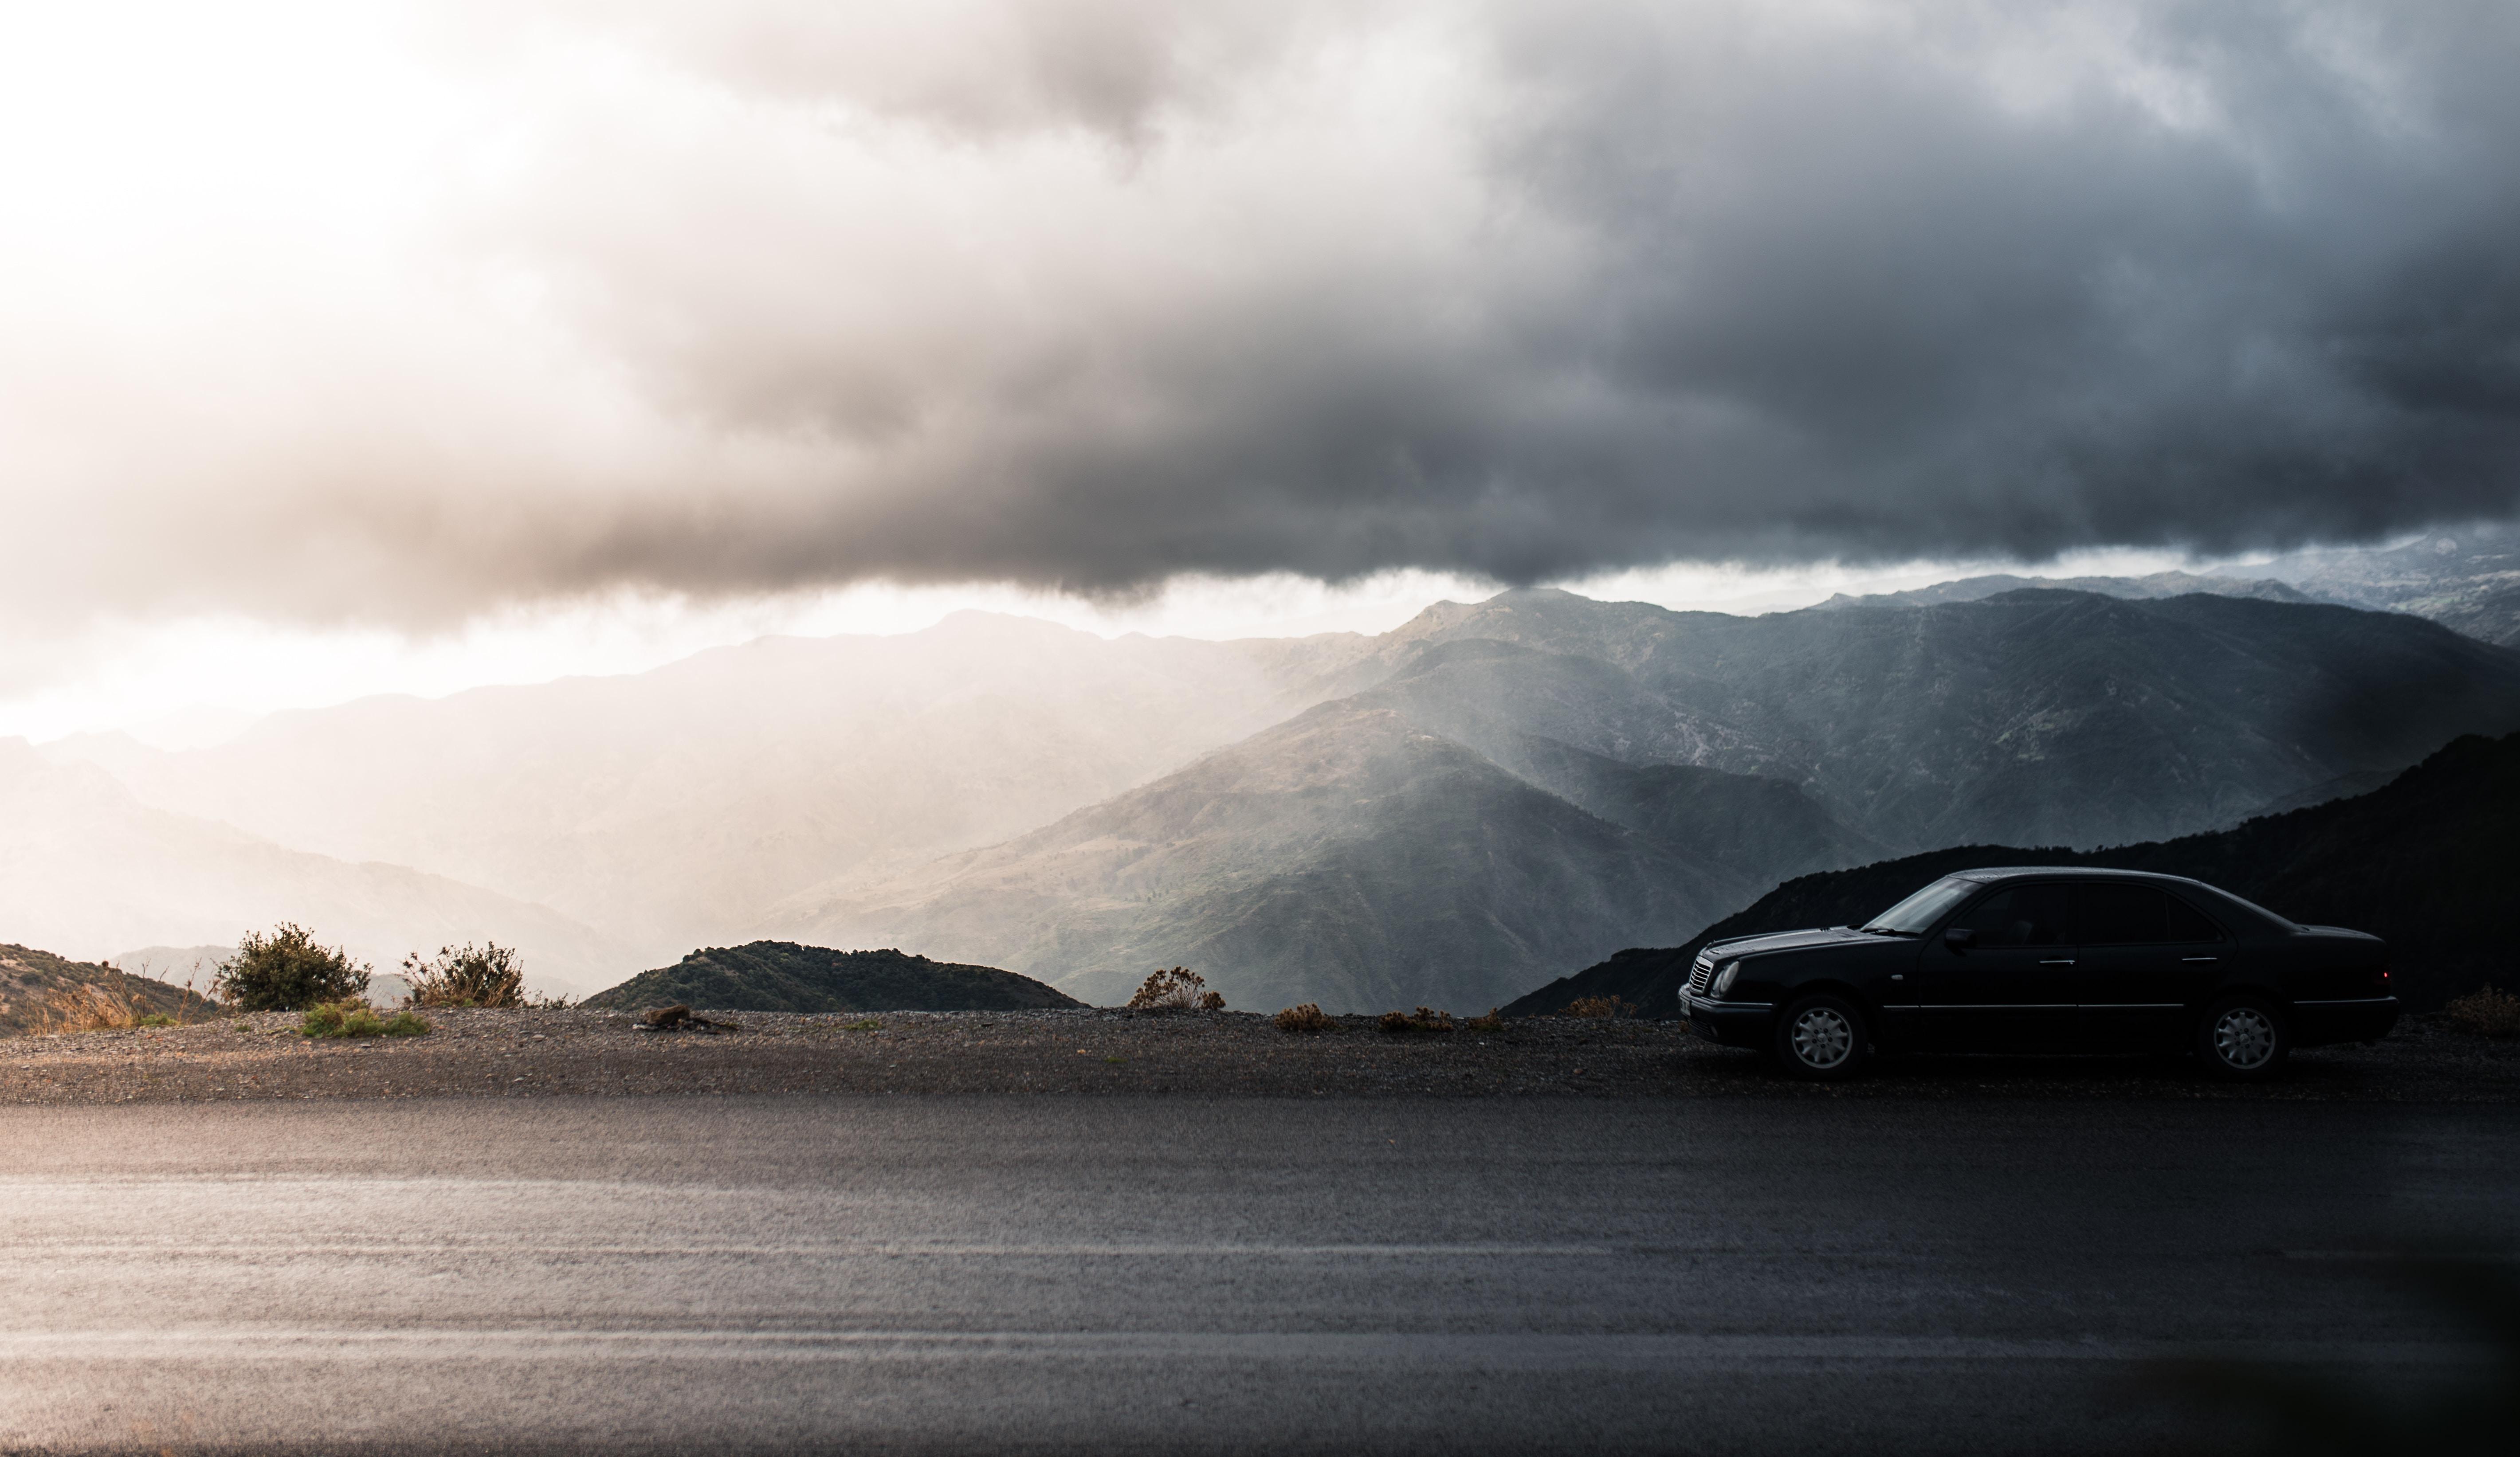 black sedan parked beside road near mountain during daytime